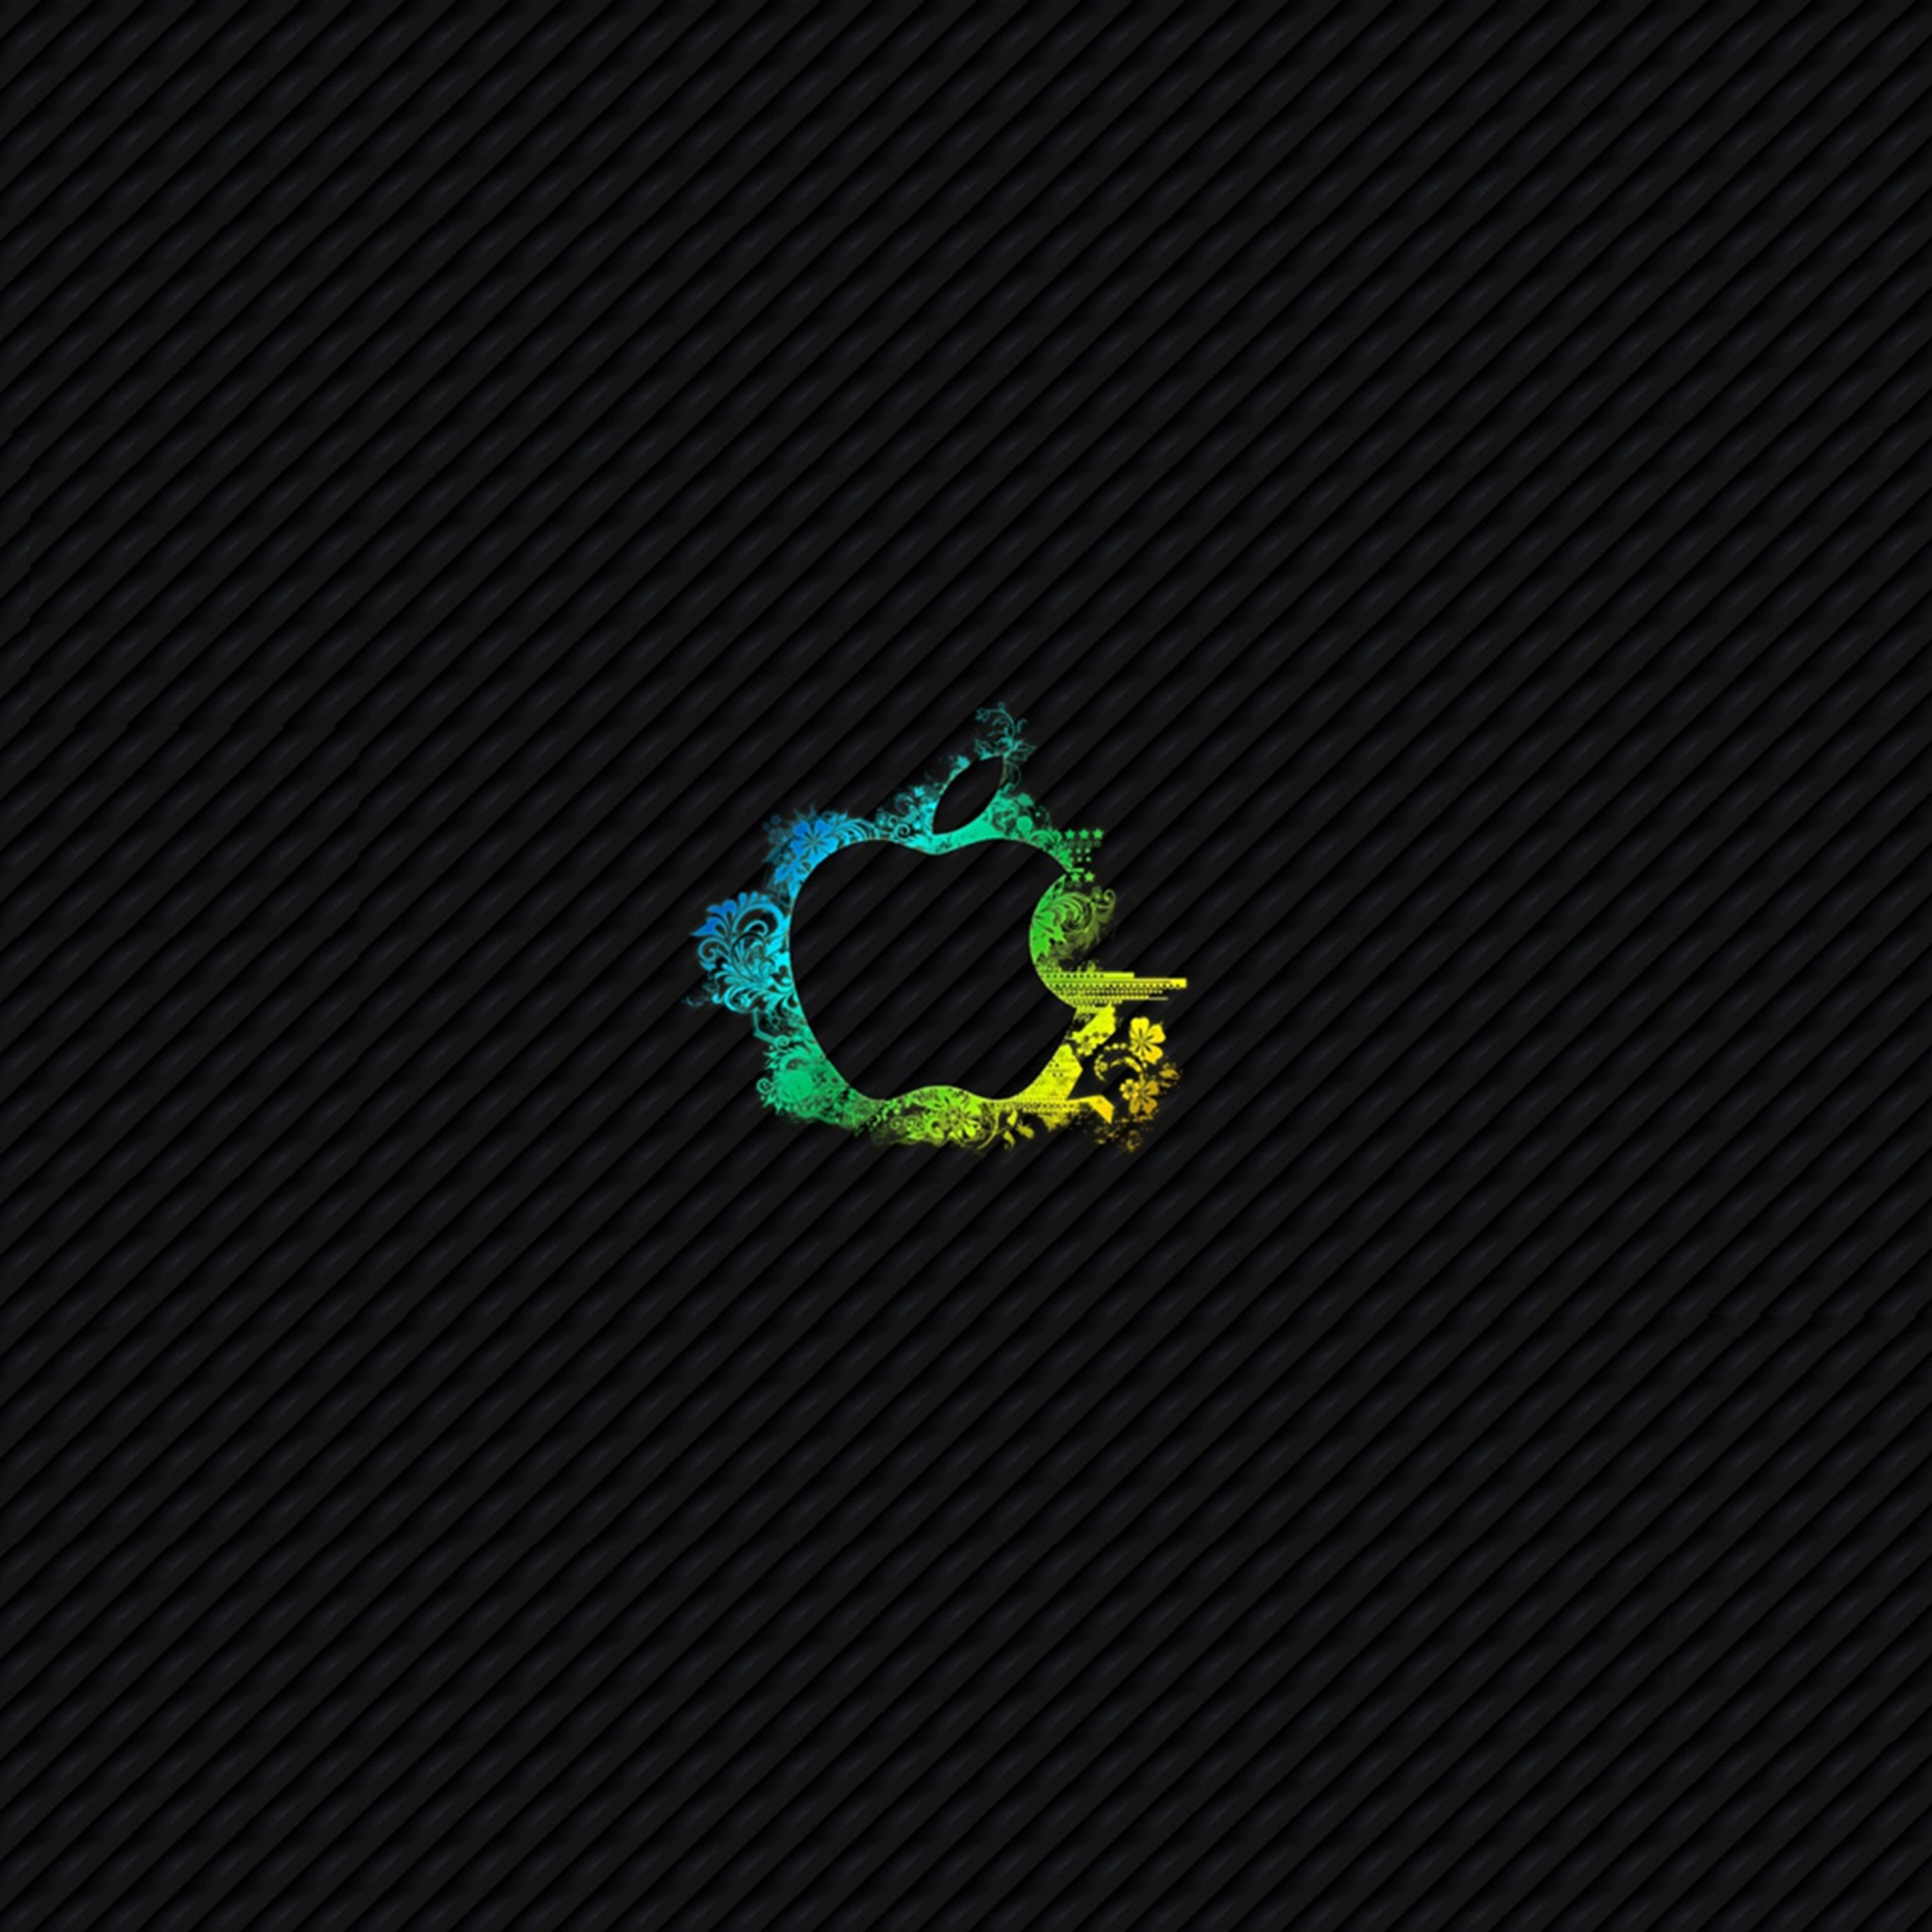 2732x2732 wallpapers 4k iPad Pro Apple Wallpaper Ipad Wallpaper 2732x2732 pixels resolution